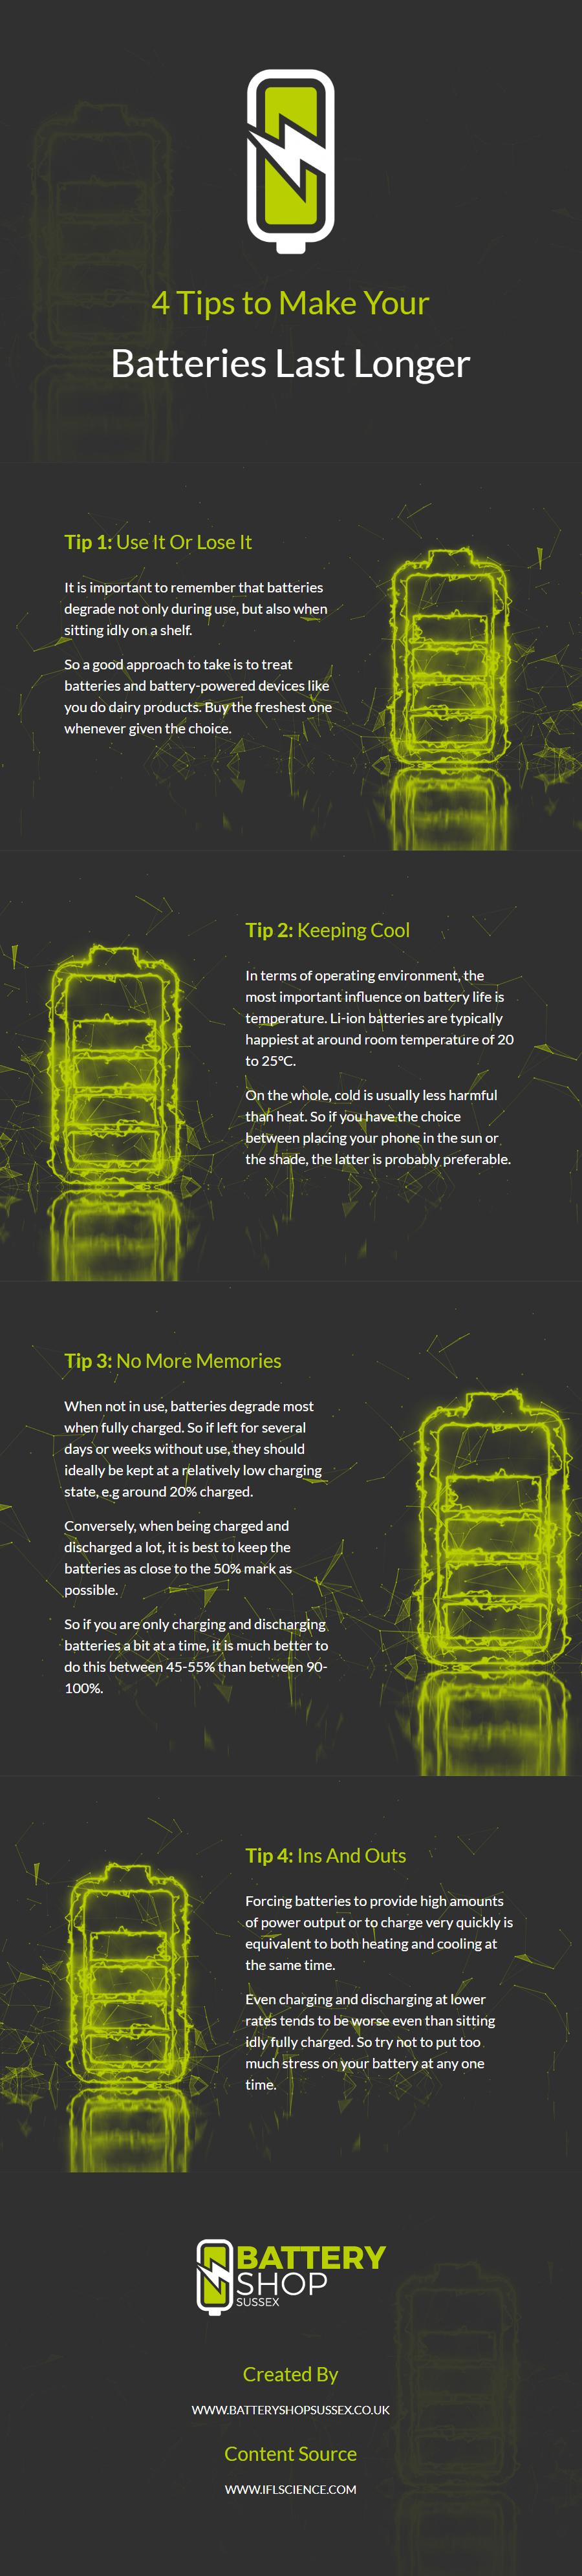 4 Tips to Make Your Batteries Last Longer